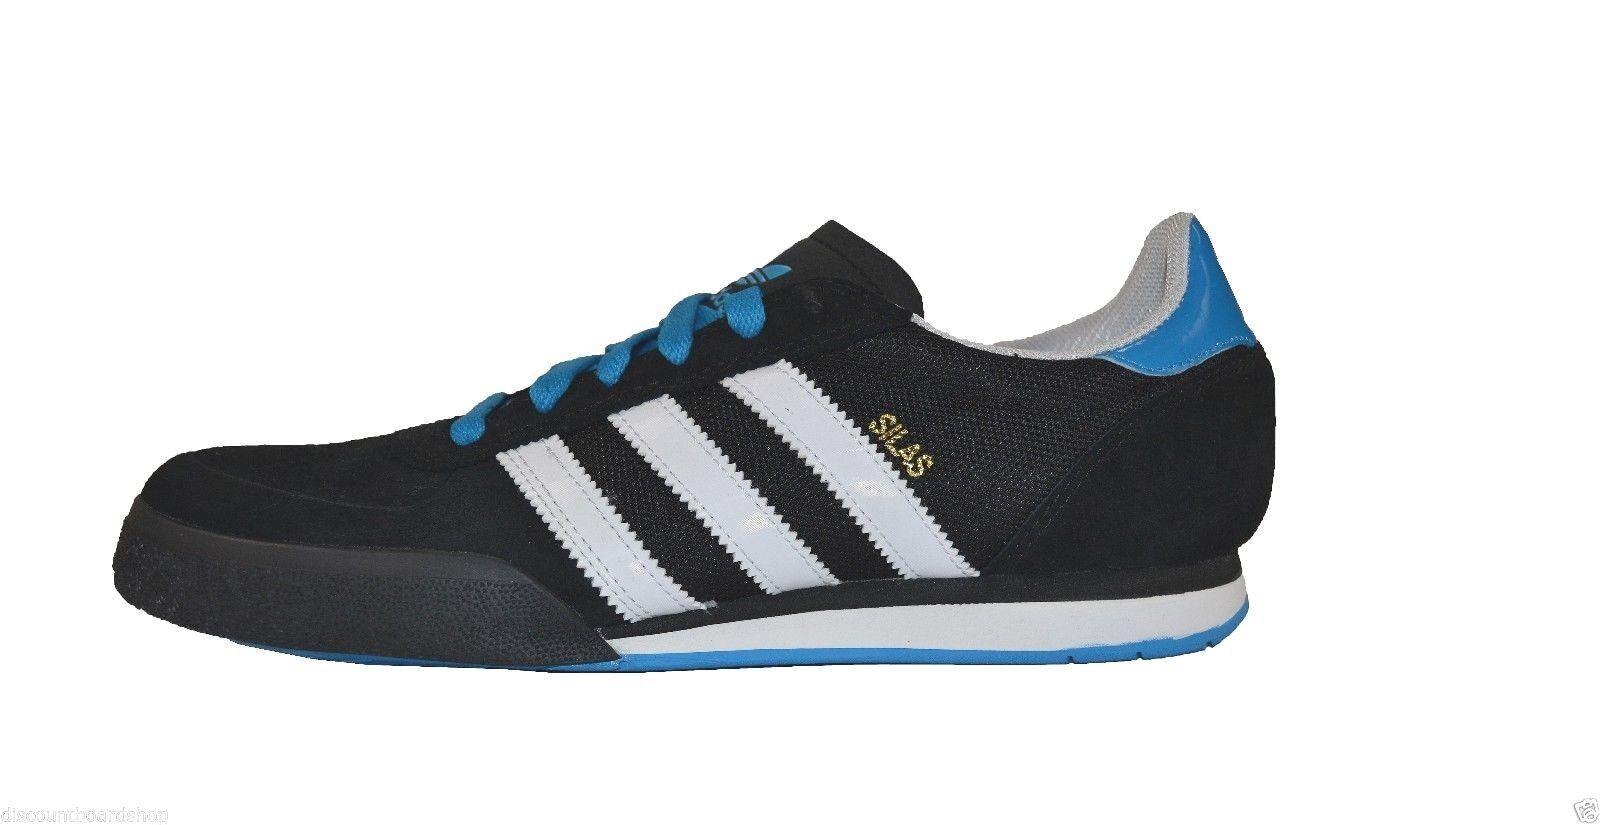 Adidas SILAS SLR Black White Blue Skateboarding D73667 Price reduction Men's Shoes